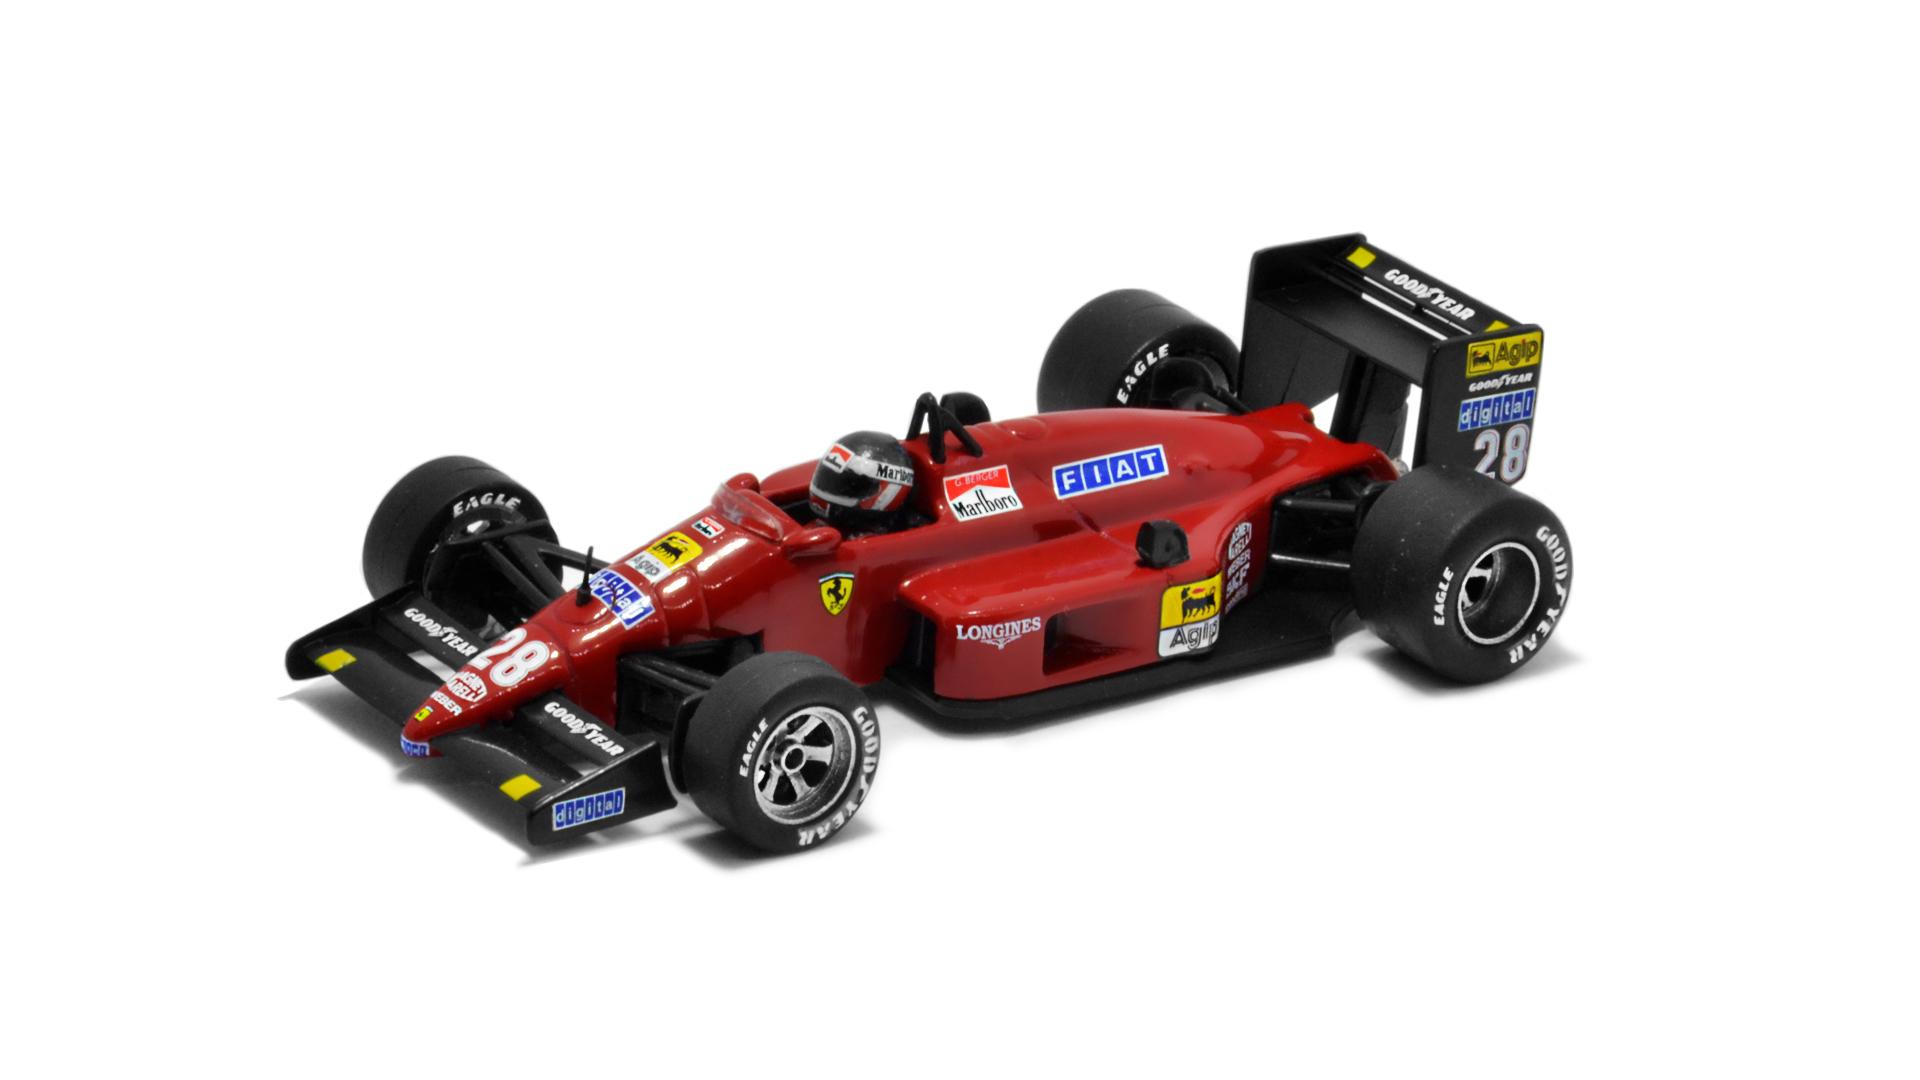 Év: 1987<br />Modell: F1/87<br />Gyártó: Atlas (átalakított)<br />Pilóta: Gerhard Berger